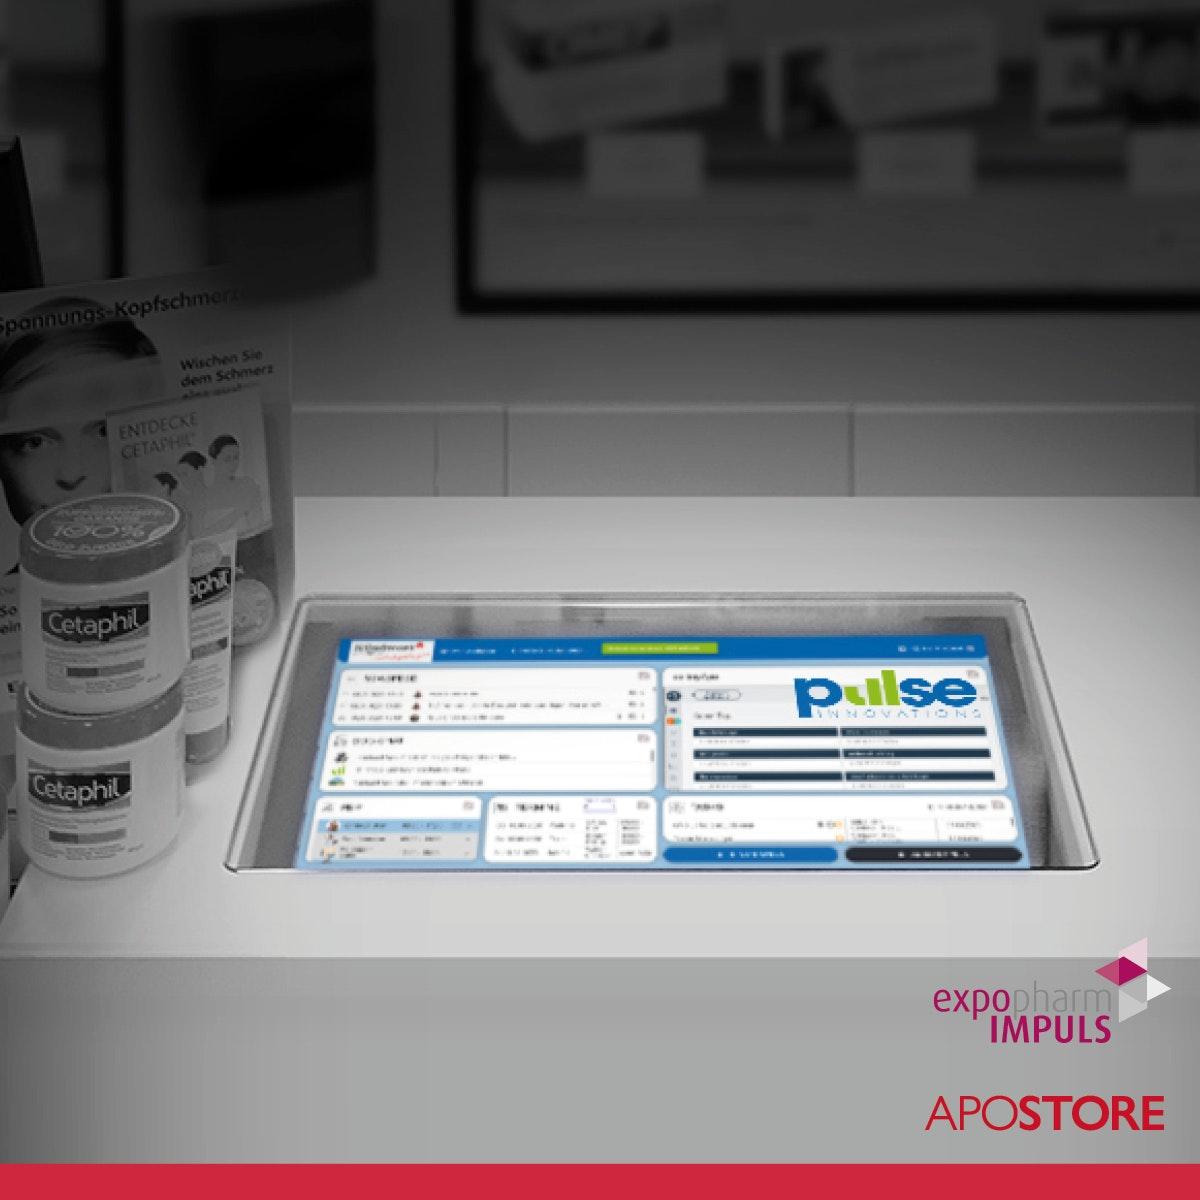 V1 202108 Apostore Kommissionierautomaten Digitale Apotheke expopharm Impuls 2021 Pulse Screen Dashboard